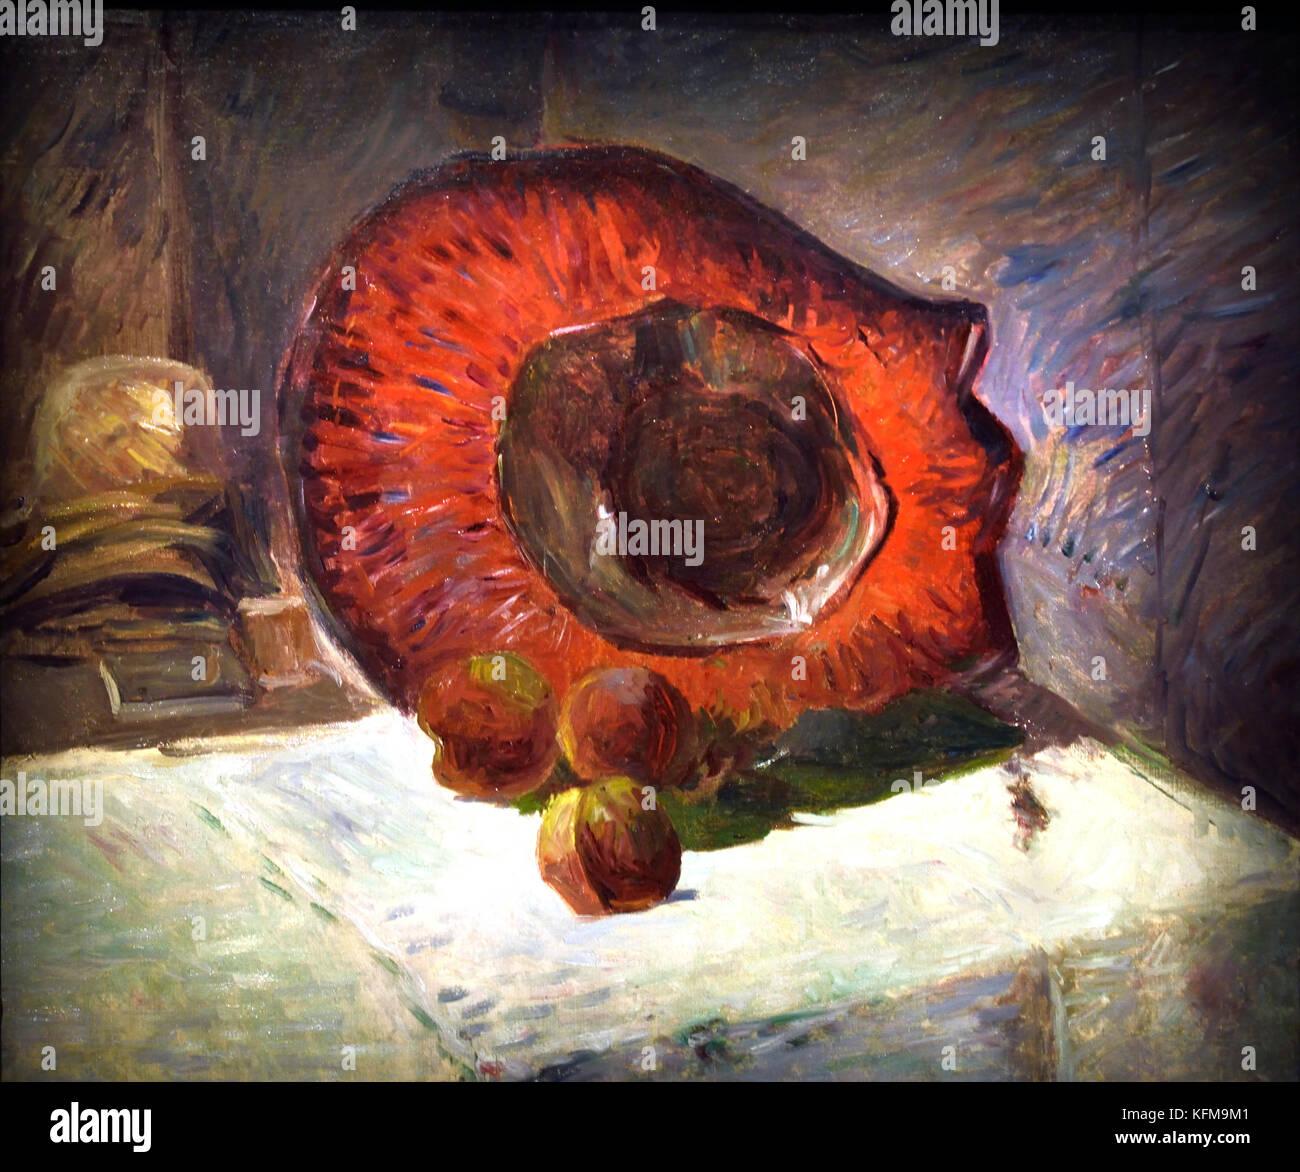 Le Chapeau Rouge - The Red Hat 1886  Paul Gauguin - Eugène Henri Paul Gauguin 1848 – 1903 was a French post - Stock Image